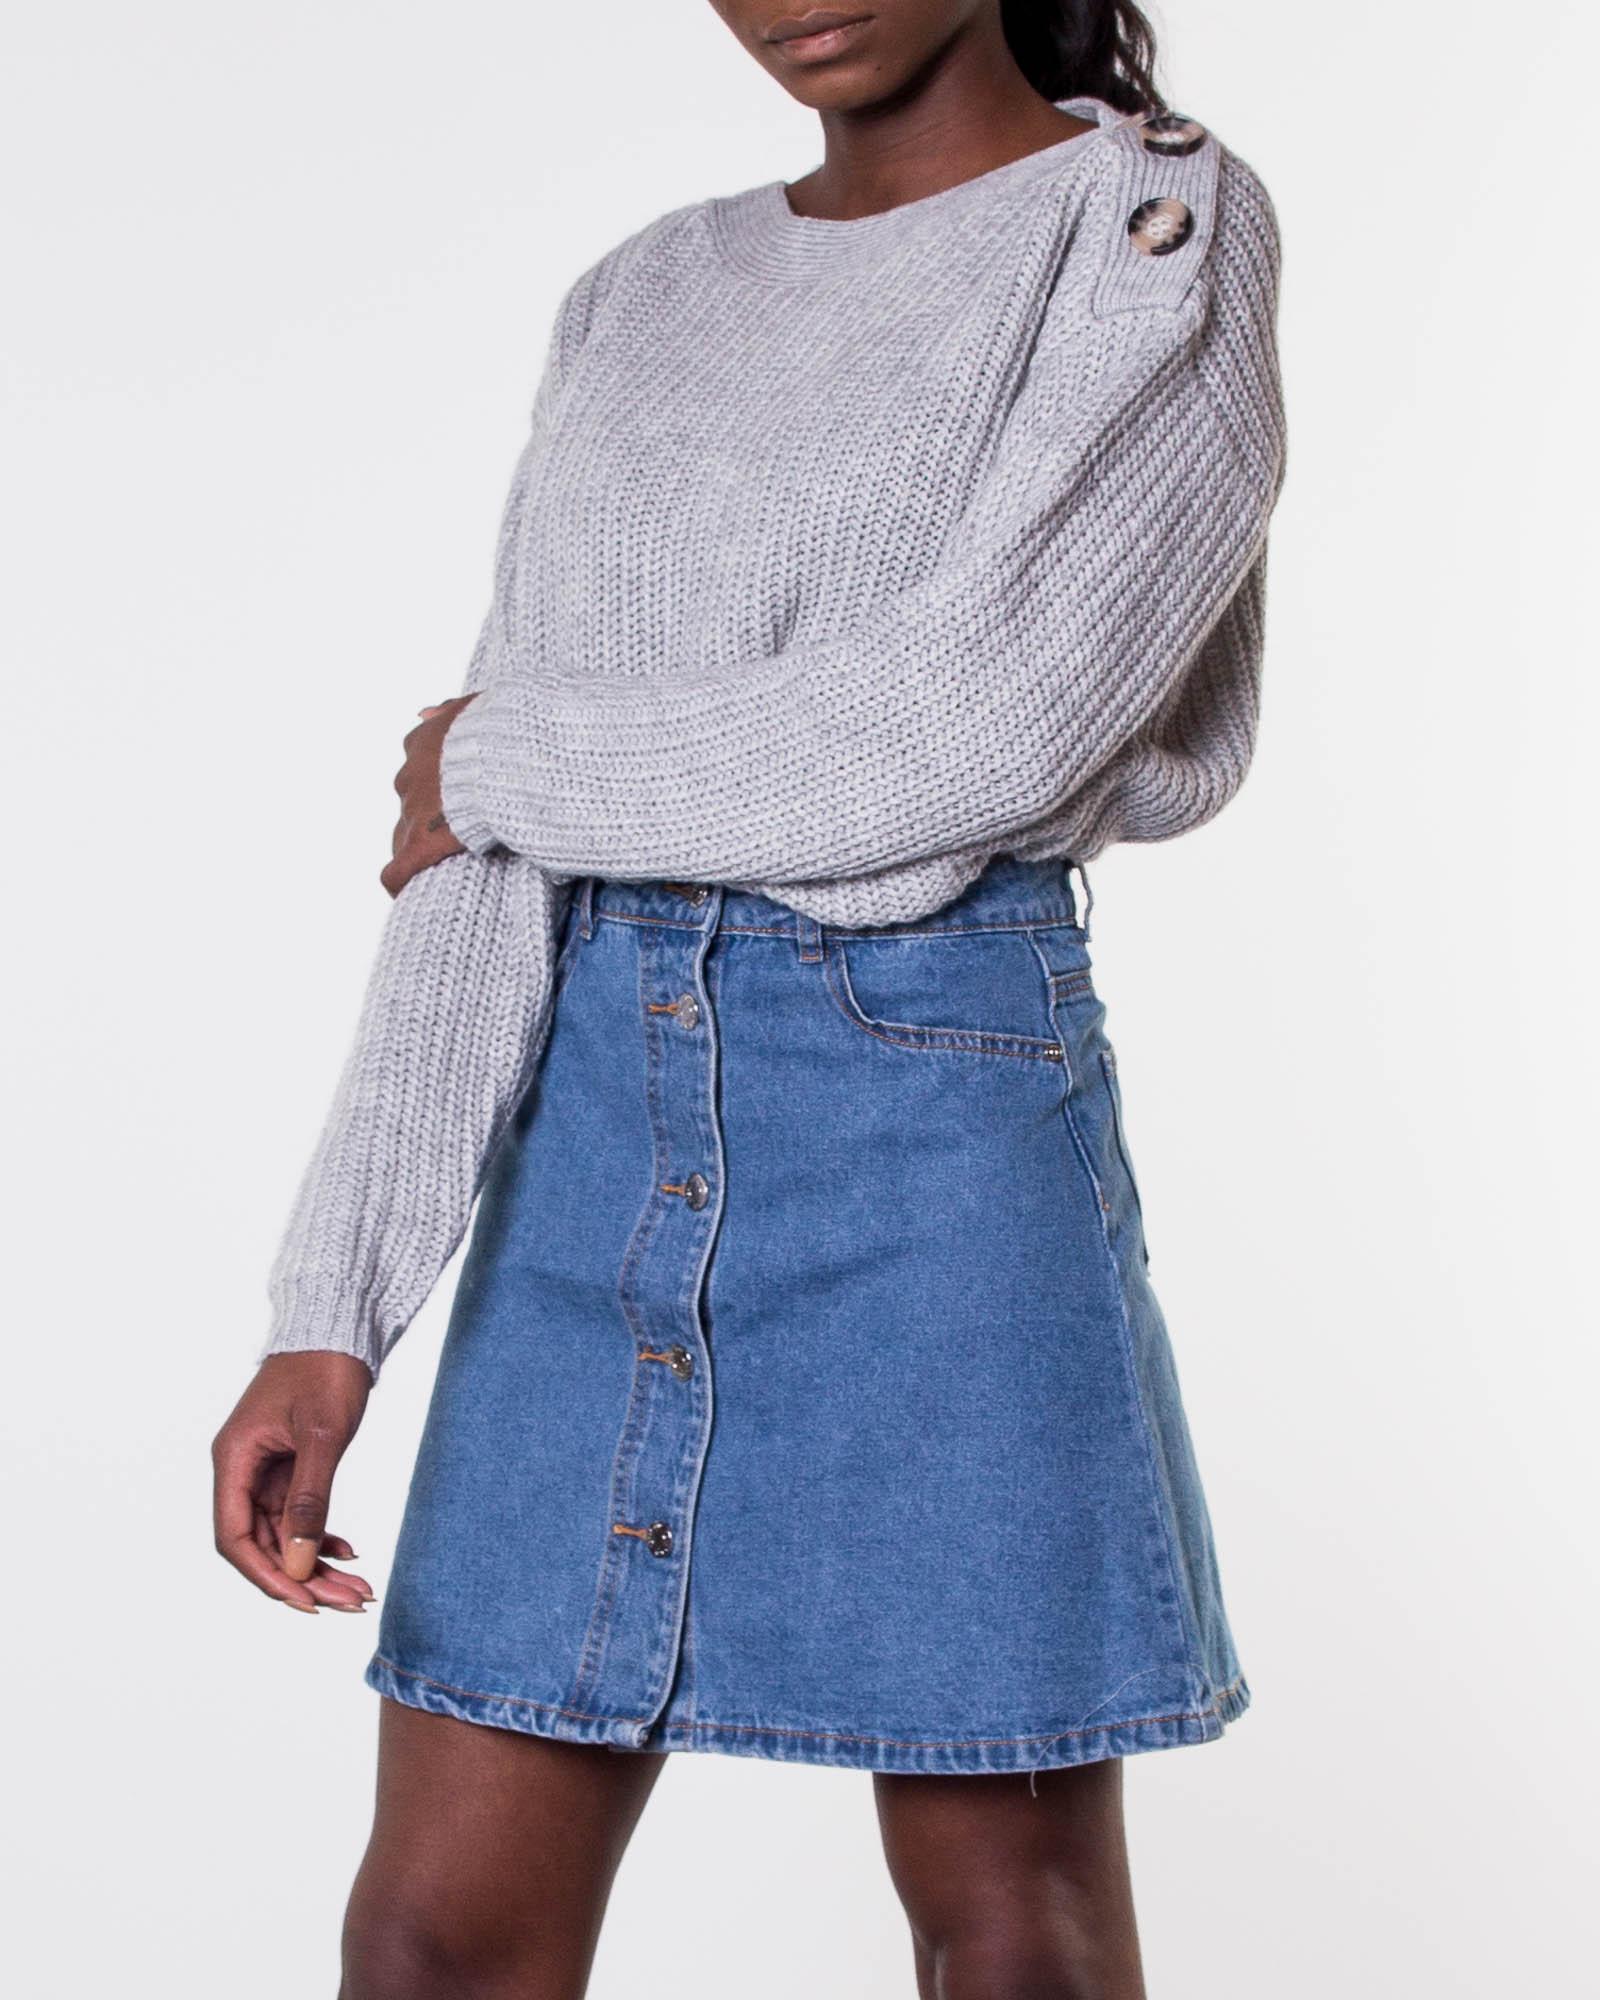 125c53fc05a676 Noisy may, Sunny Short Skater Skirt Medium Blue Denim | Women's Skirts |  HOUSEOFBRANDON.COM